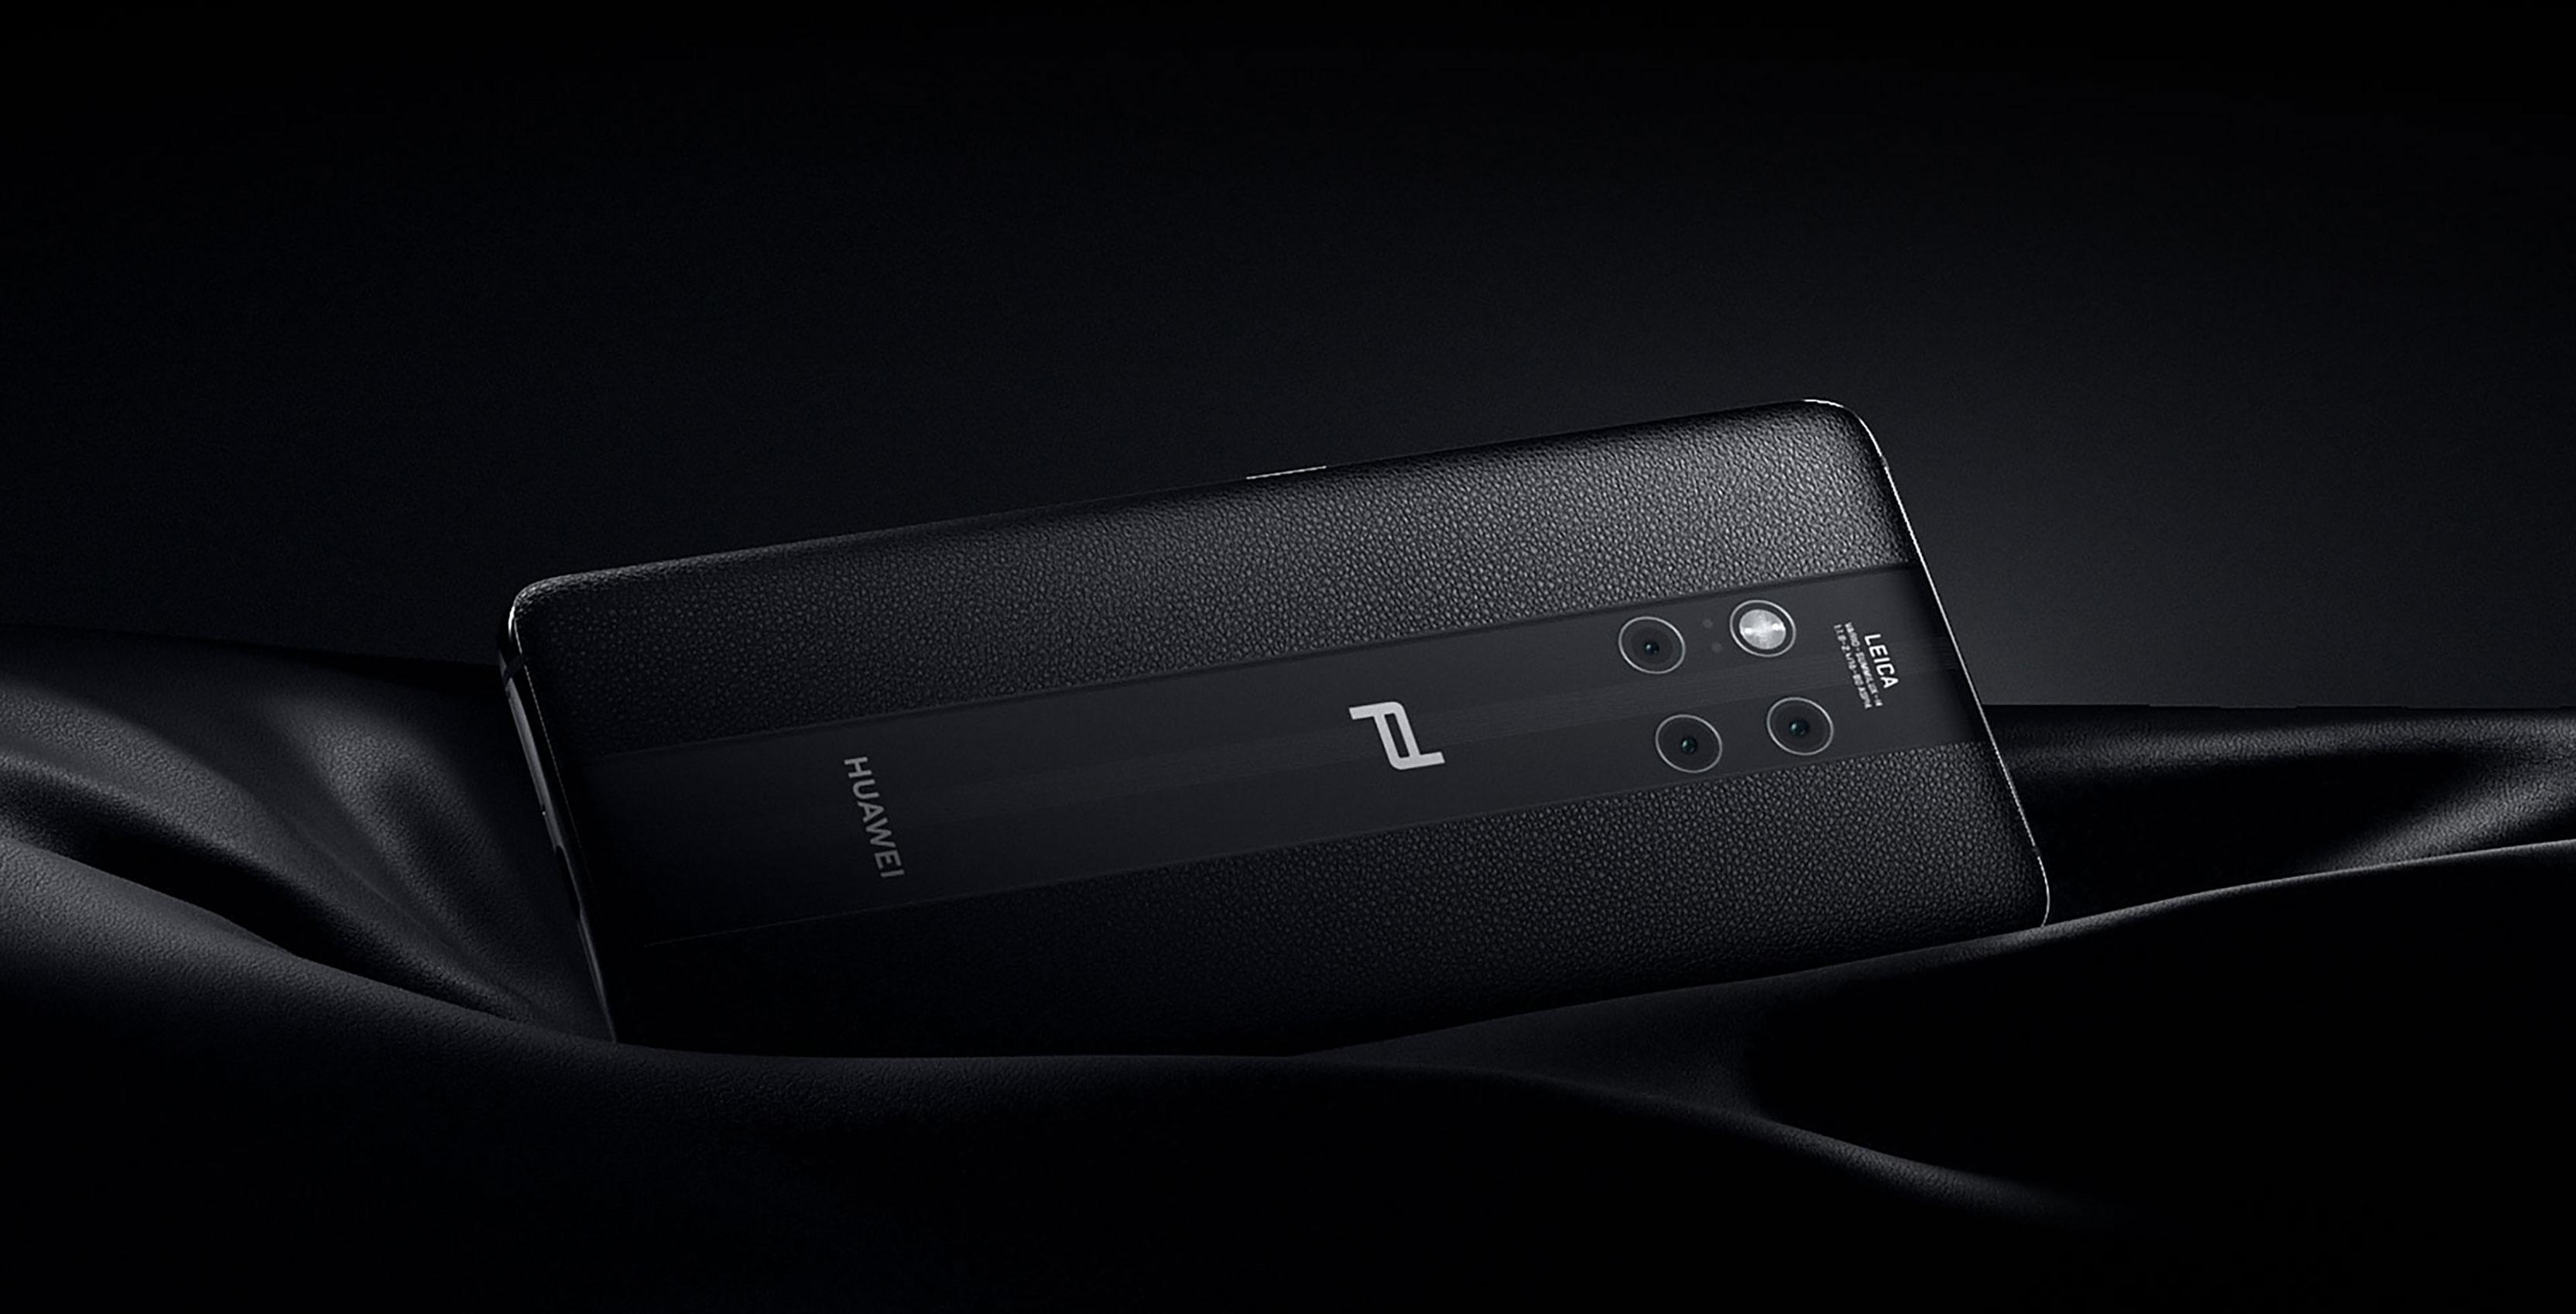 Huawei announces Mate 20 RS Porsche Design and Huawei Watch GT